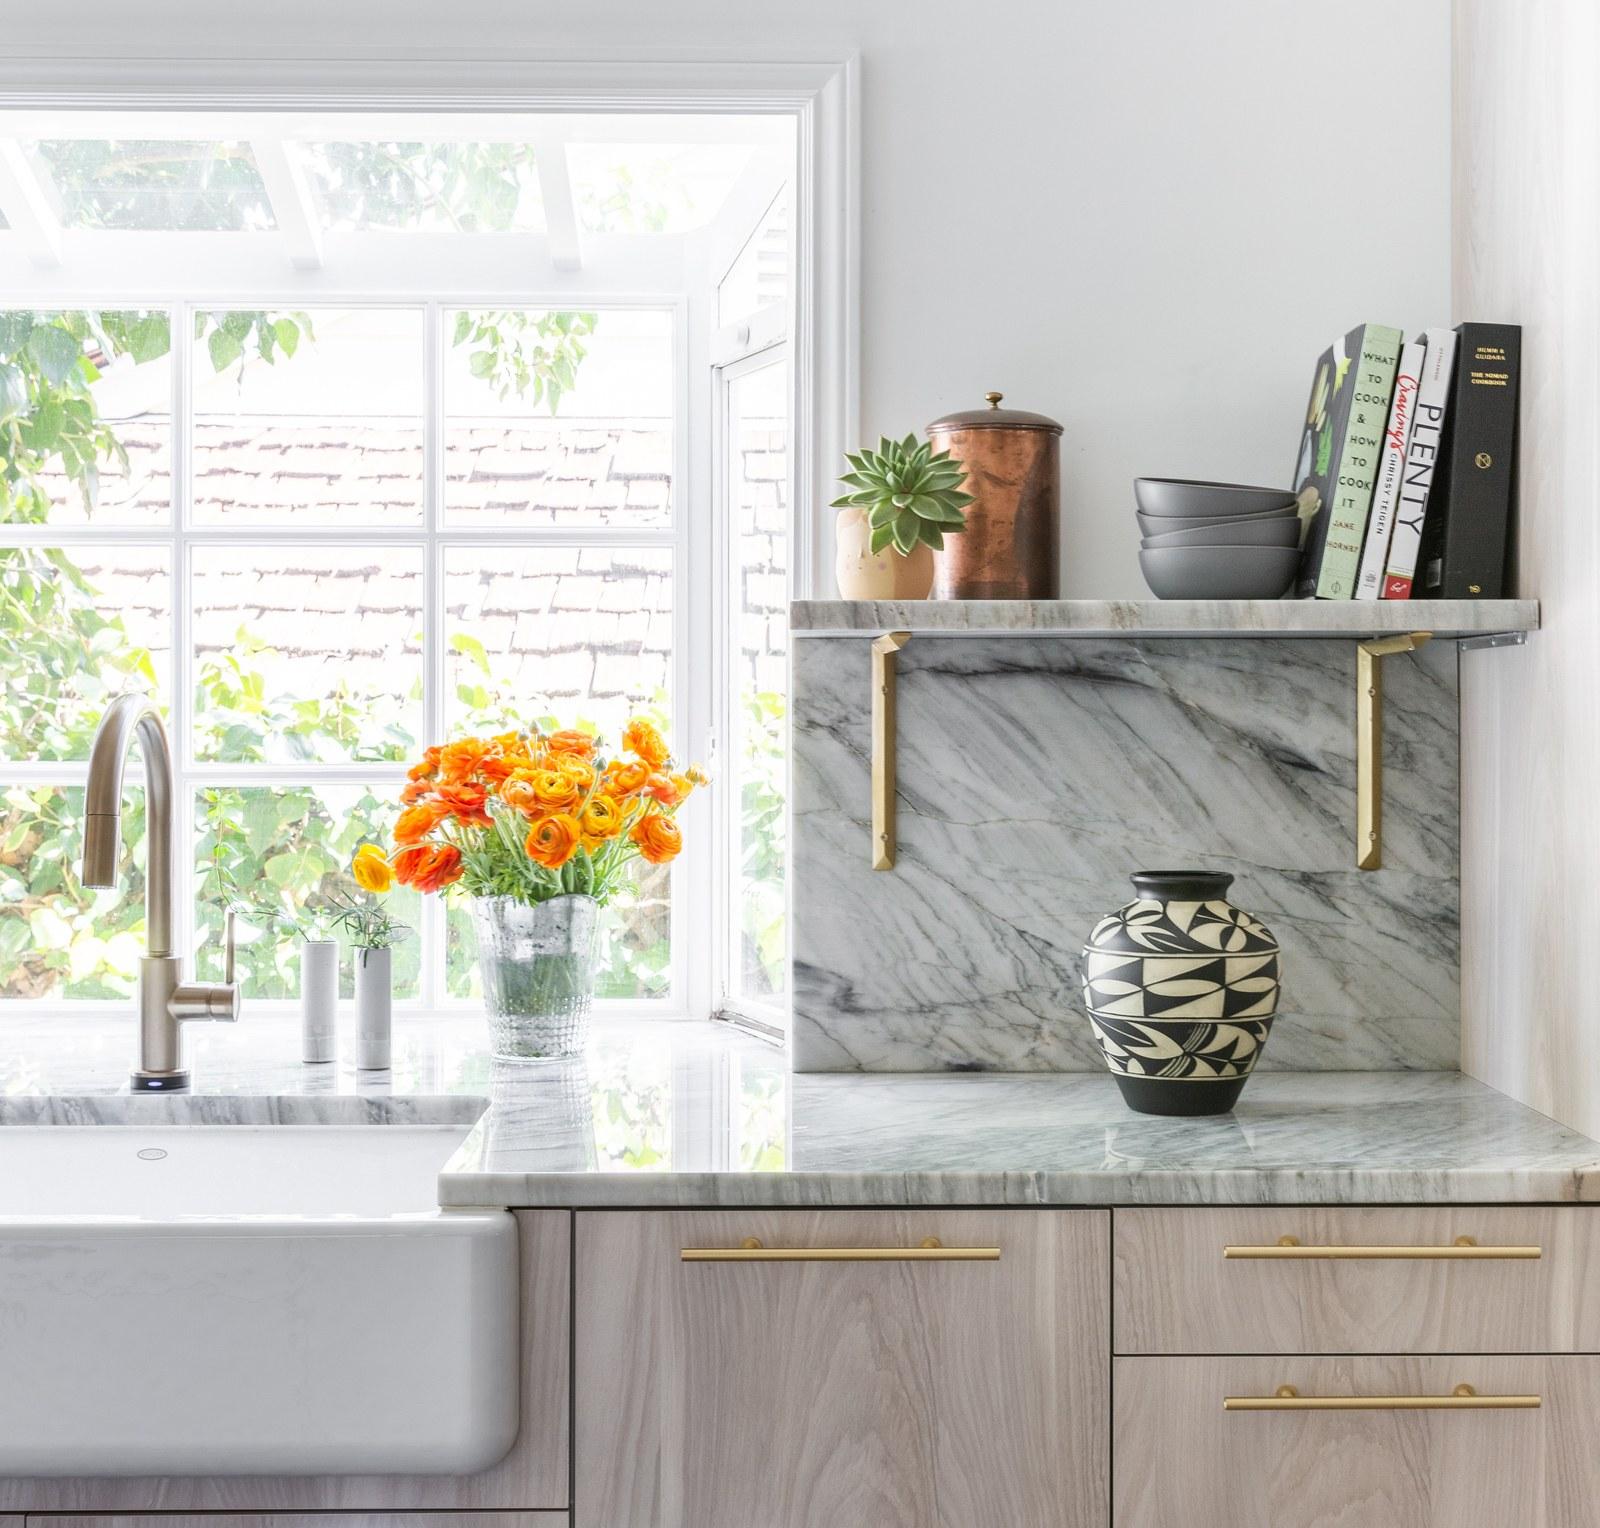 Quartzite countertop, backsplash, and floating shelf. Photo via  Architectural Digest